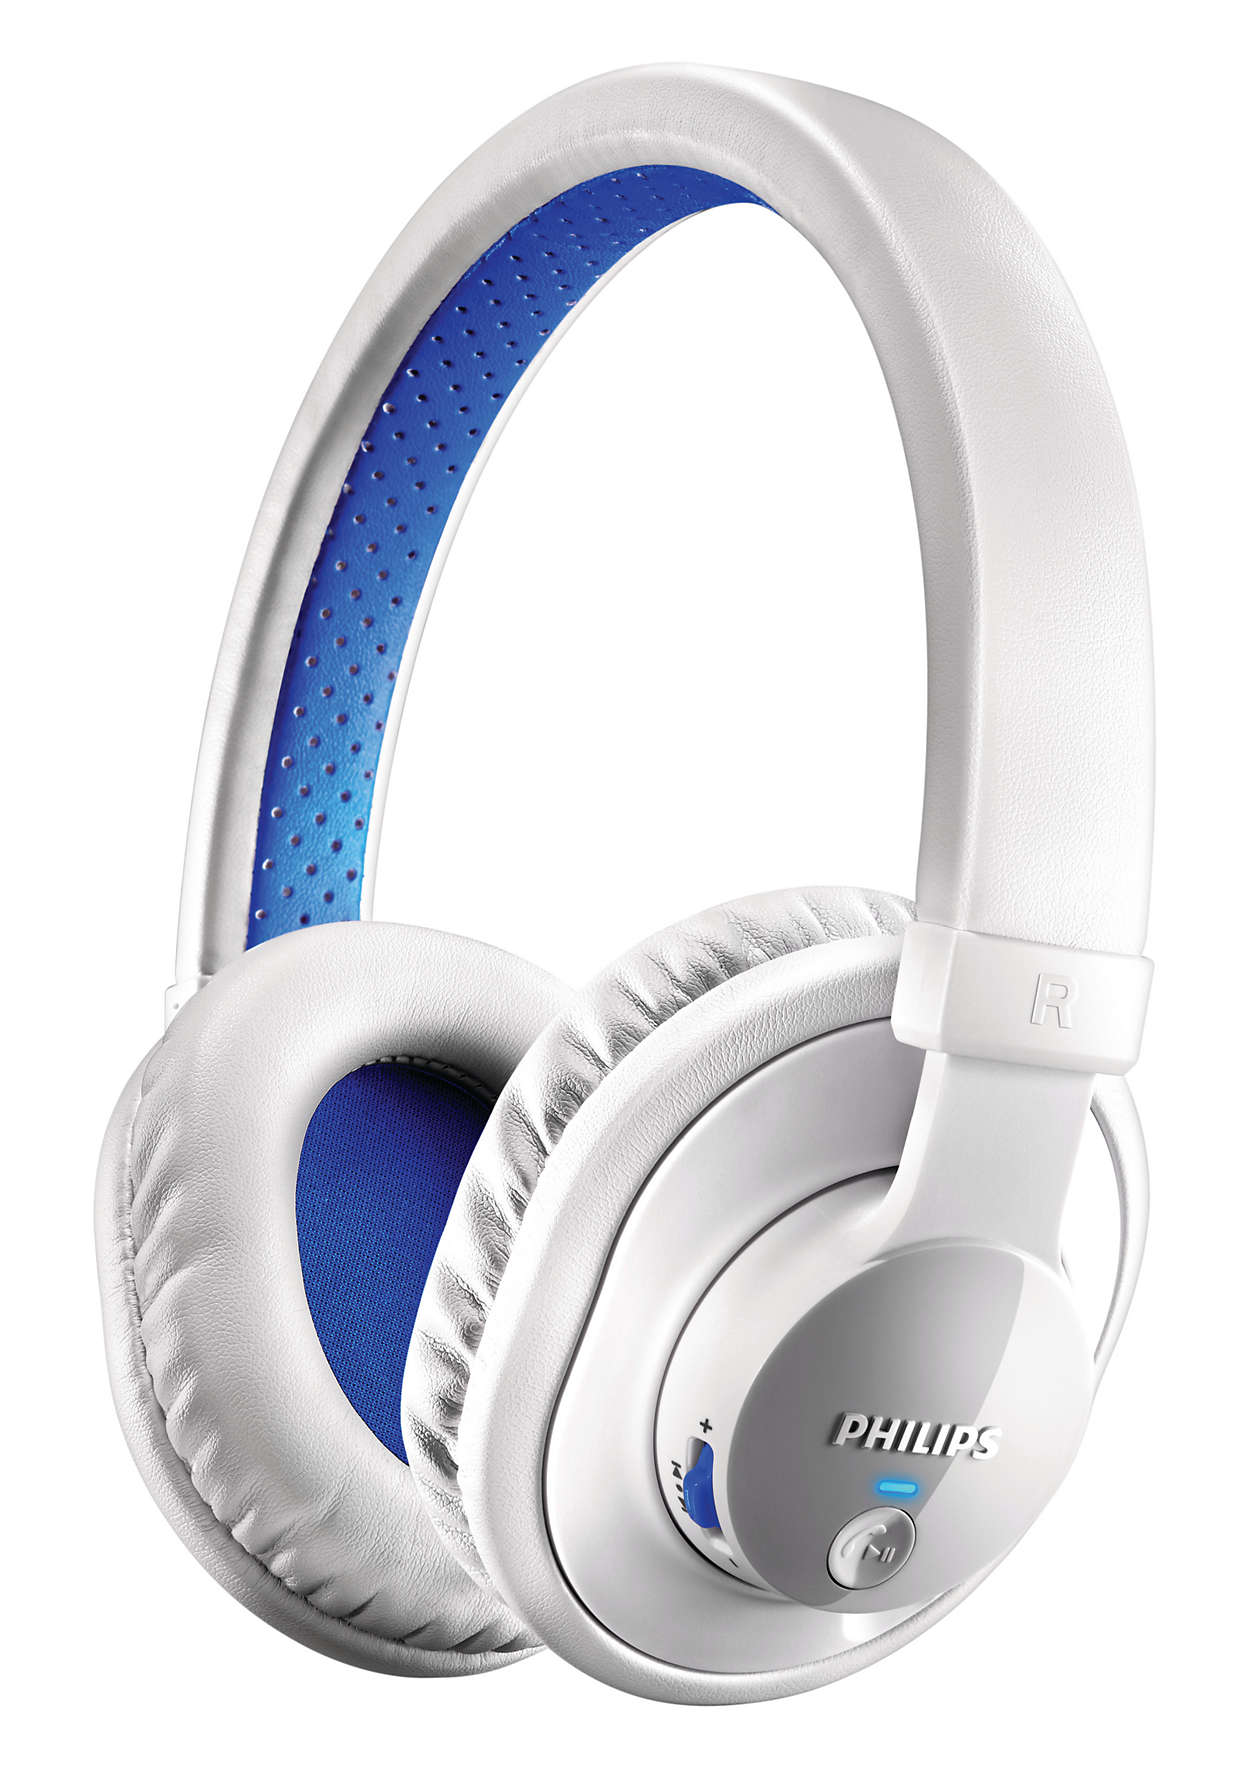 Yüksek performanslı kablosuz ses